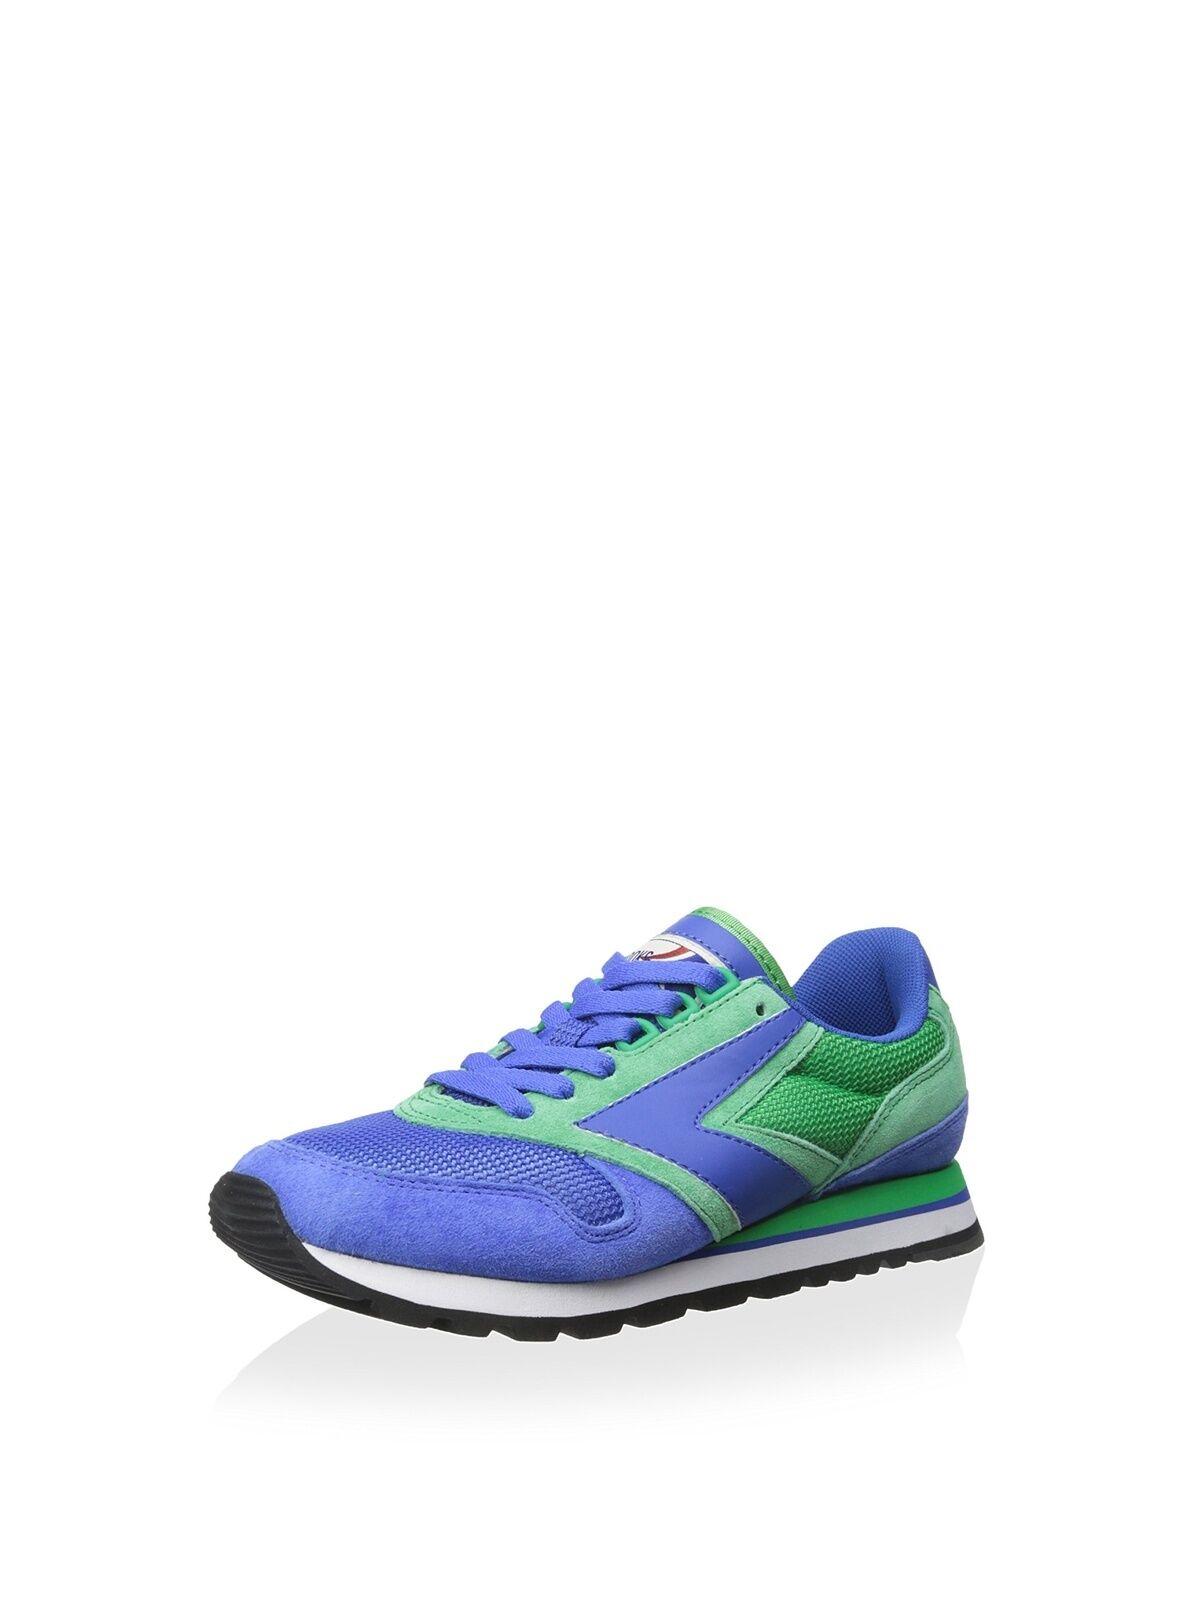 Brooks Chariot Shoes (9) Dazzling Blue / verde Bright verde / b62393